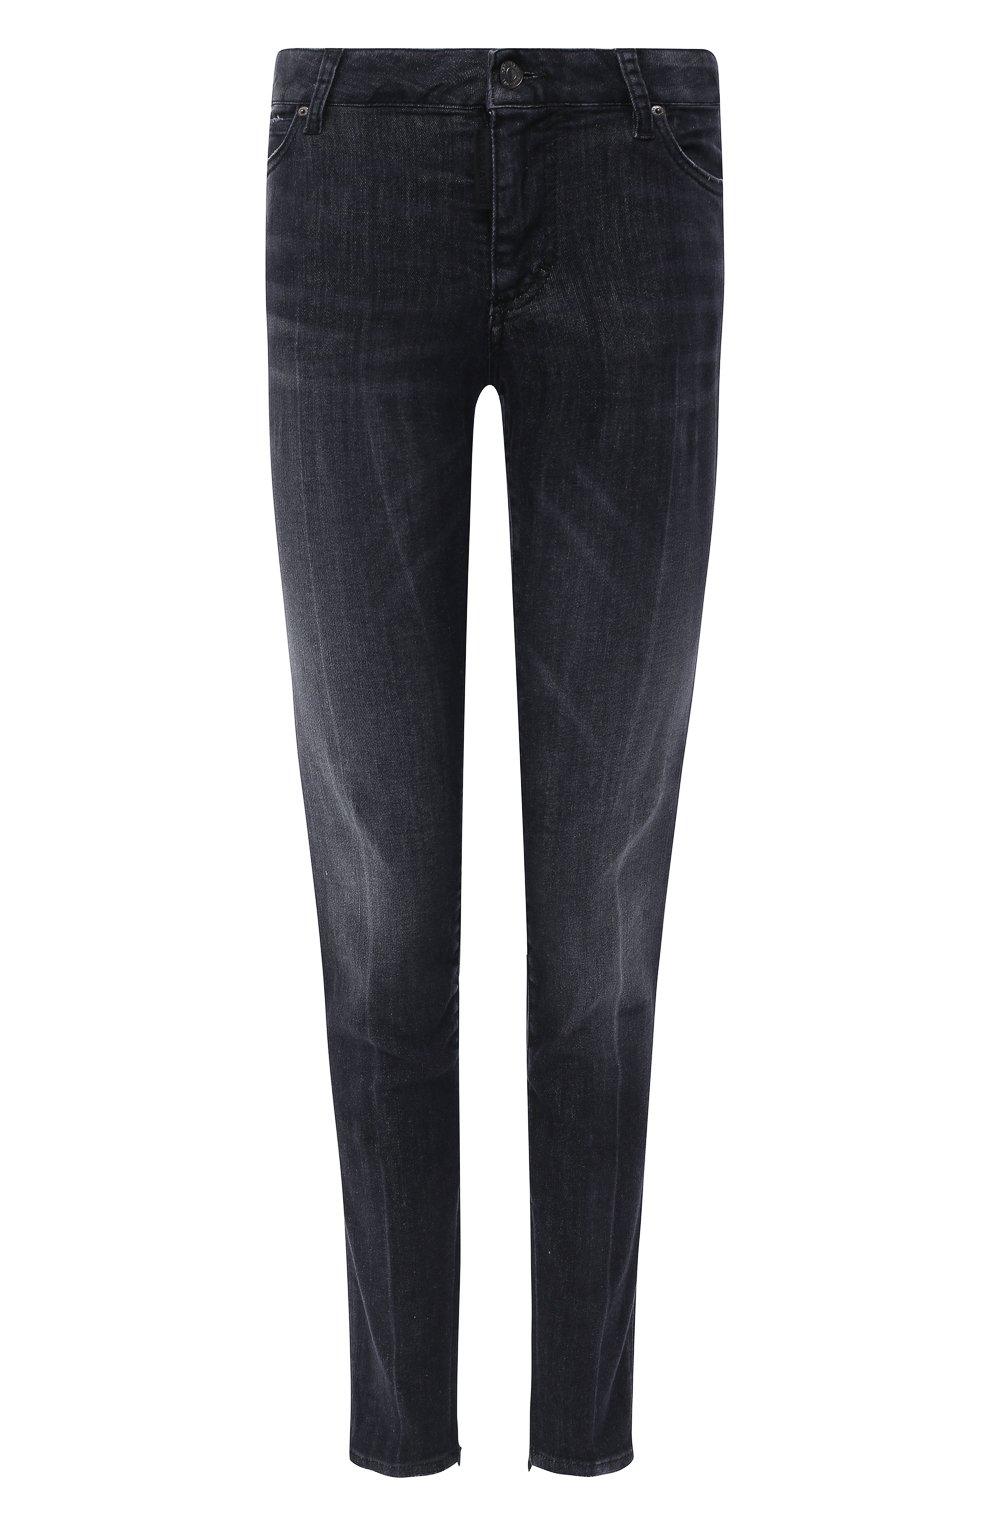 Женские джинсы DSQUARED2 черного цвета, арт. S75LB0381/S30503 | Фото 1